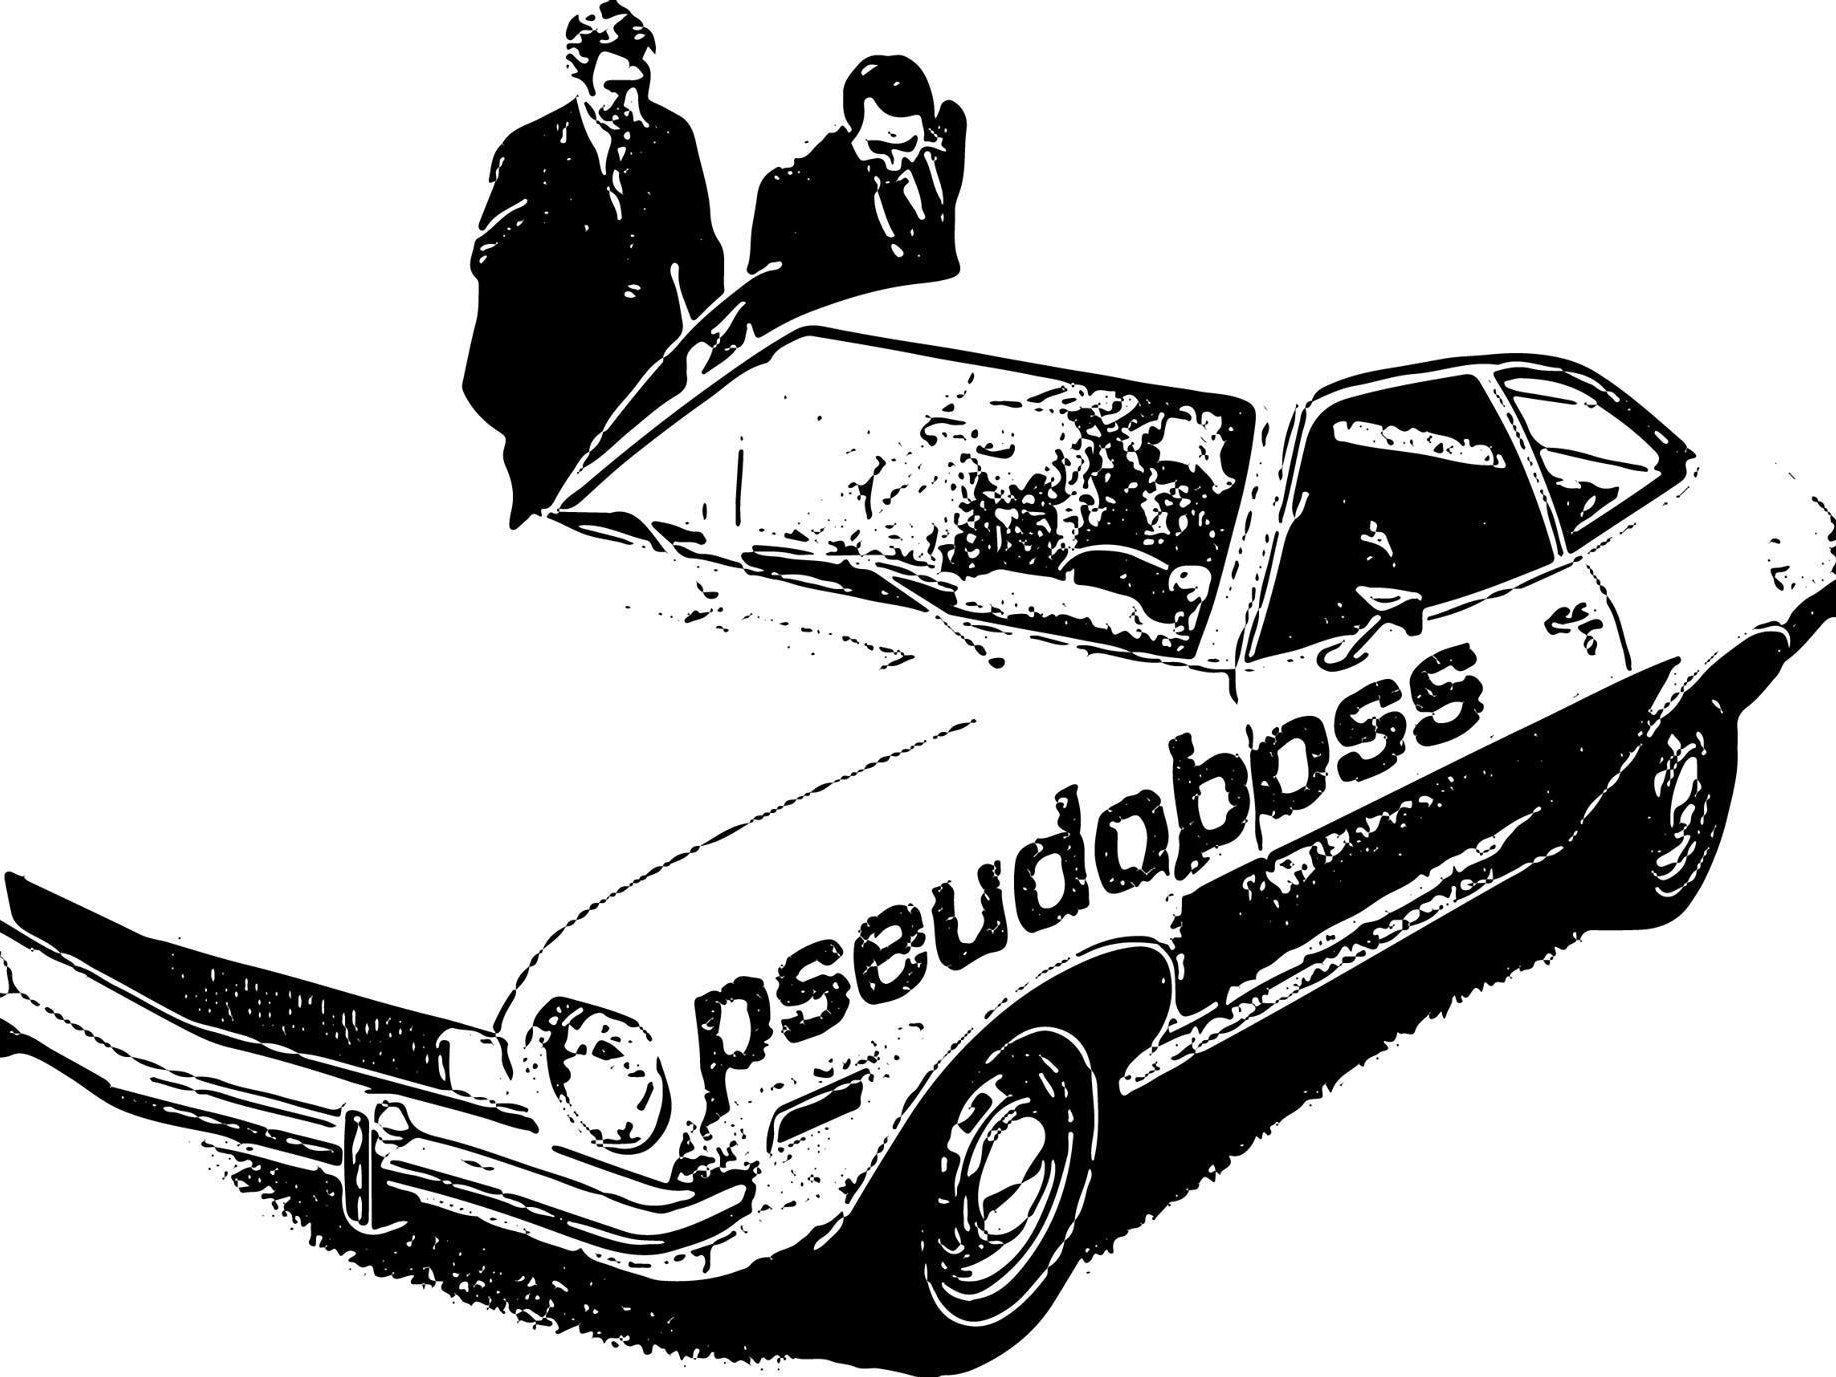 Image for pseudoboss